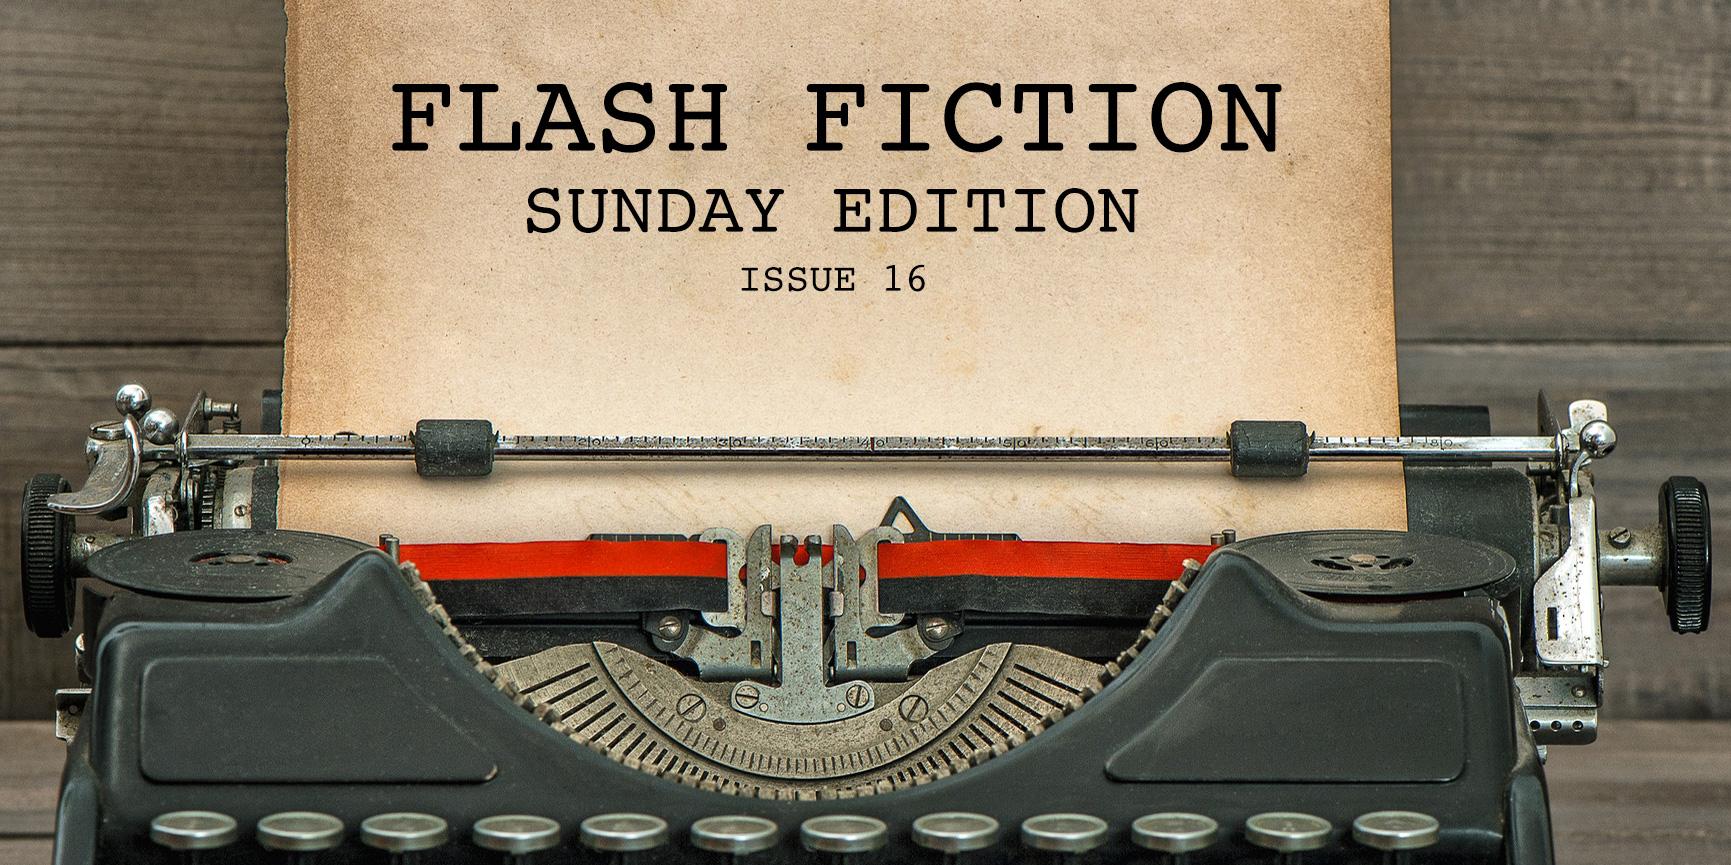 Flash Fiction Sunday Edition - Issue 16